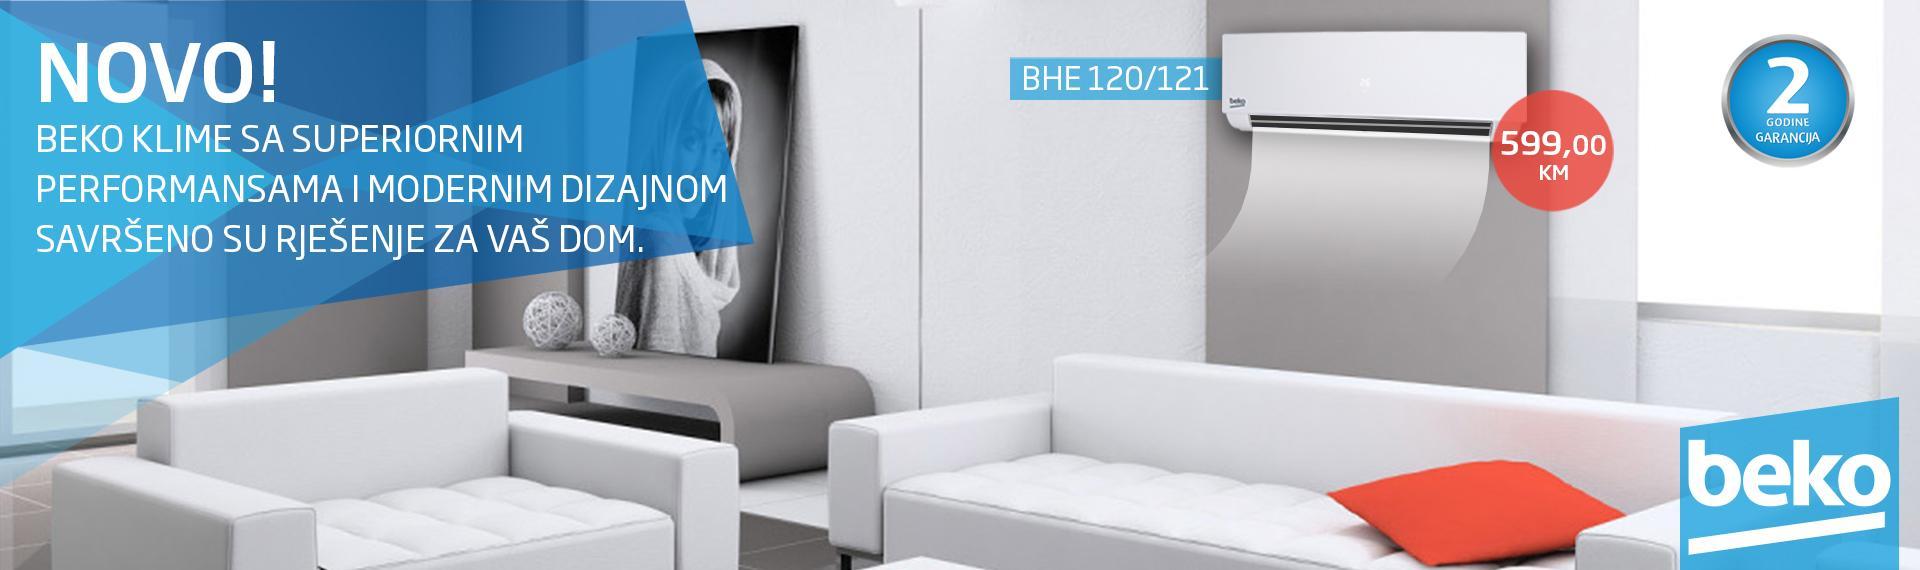 Klima BHE 120/121